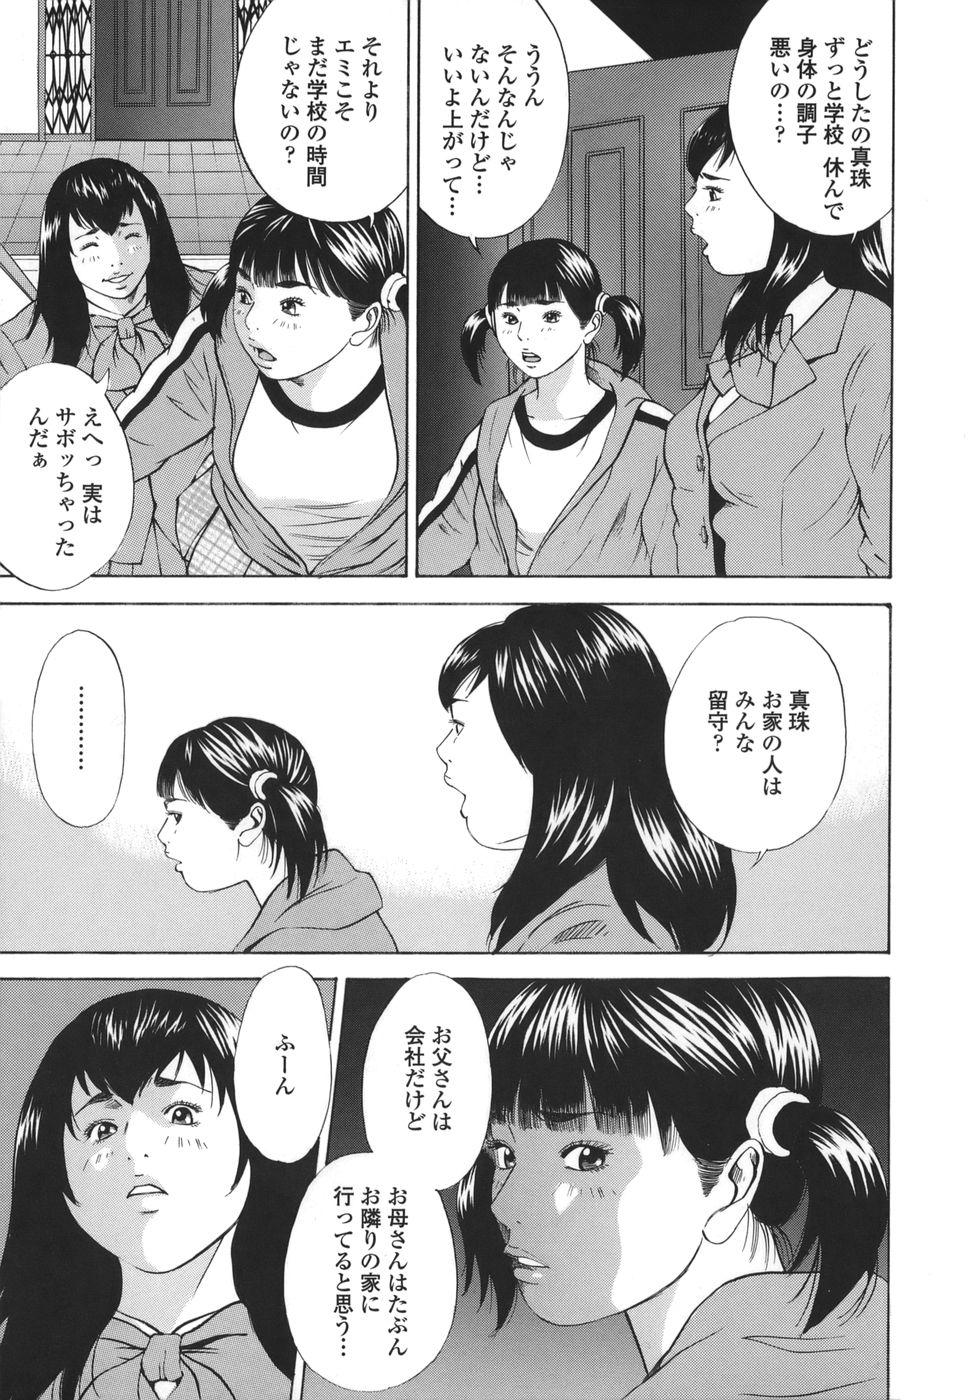 Kinshin Goukan - Near Relation Rapes 152